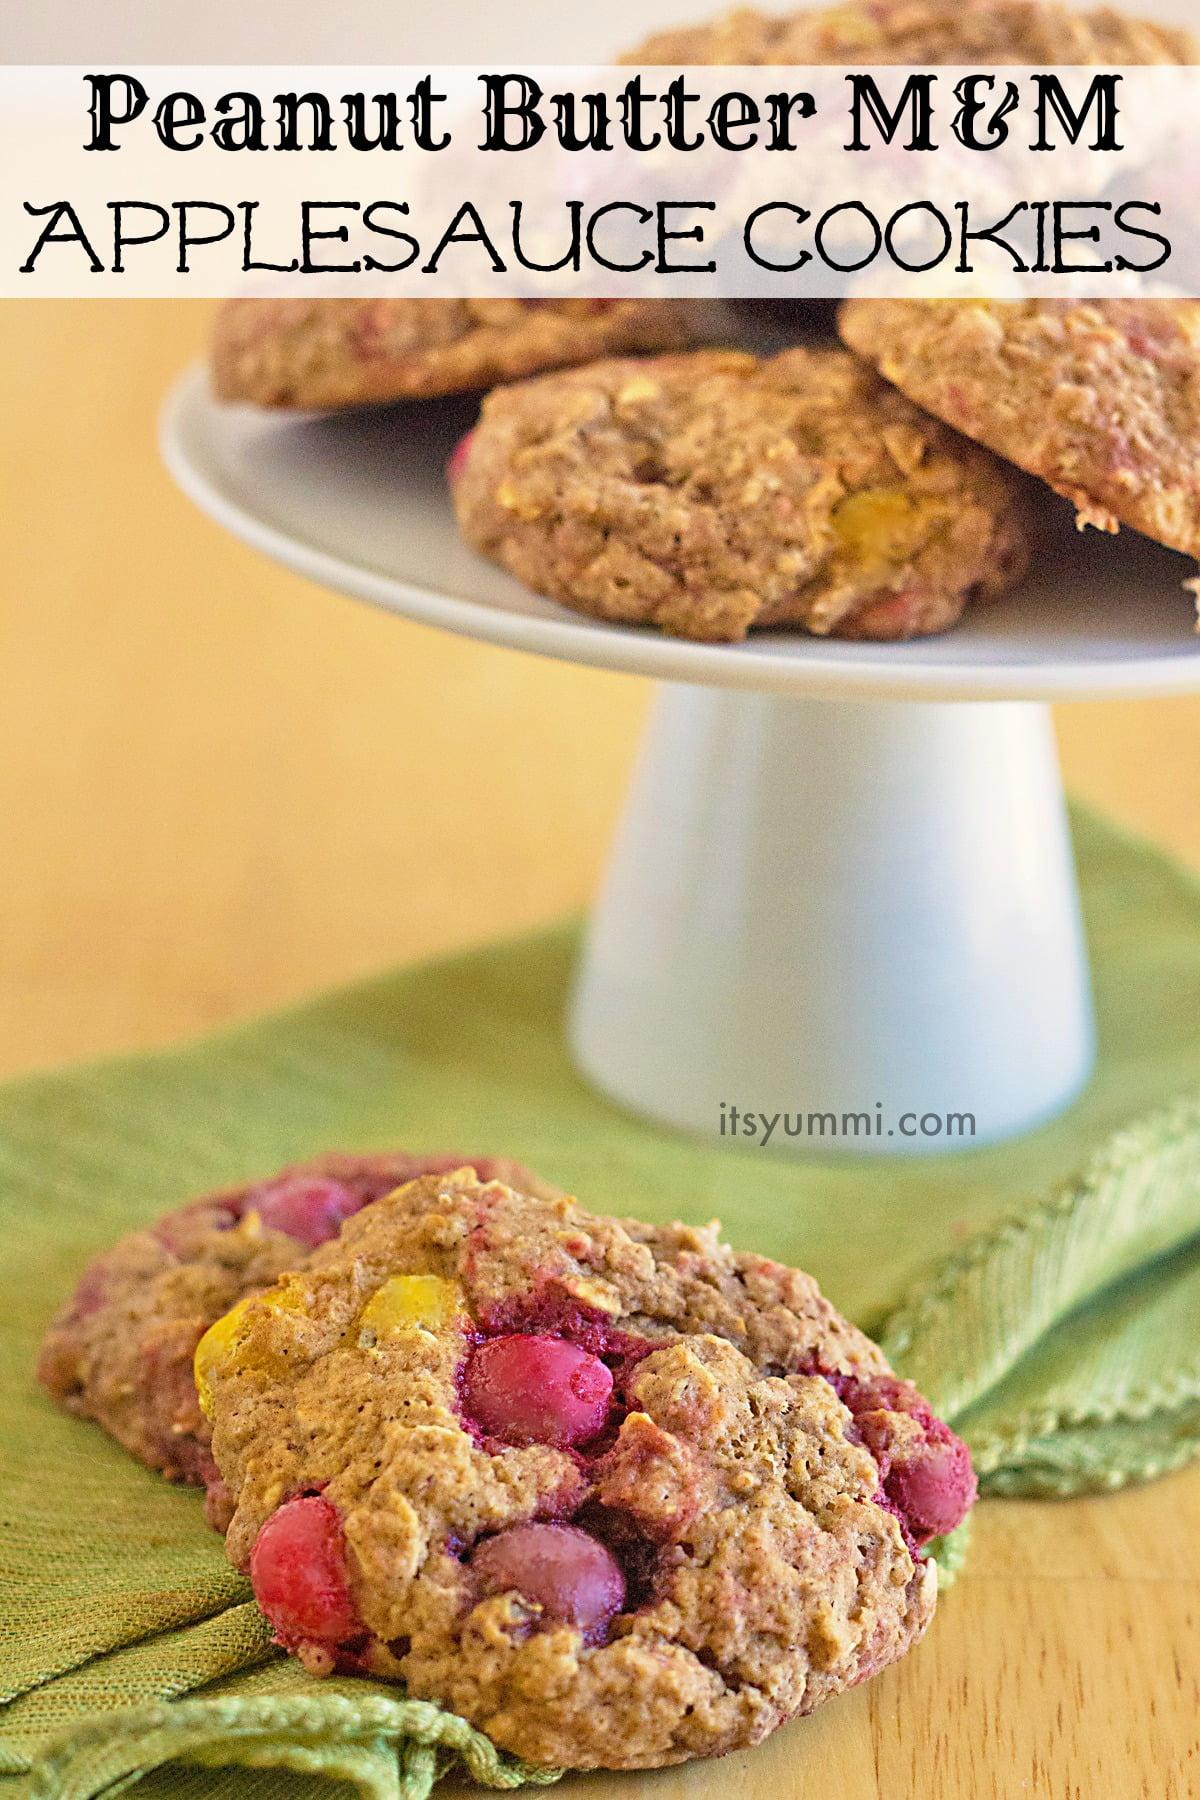 Peanut Butter M&M Applesauce Cookies from ItsYummi.com